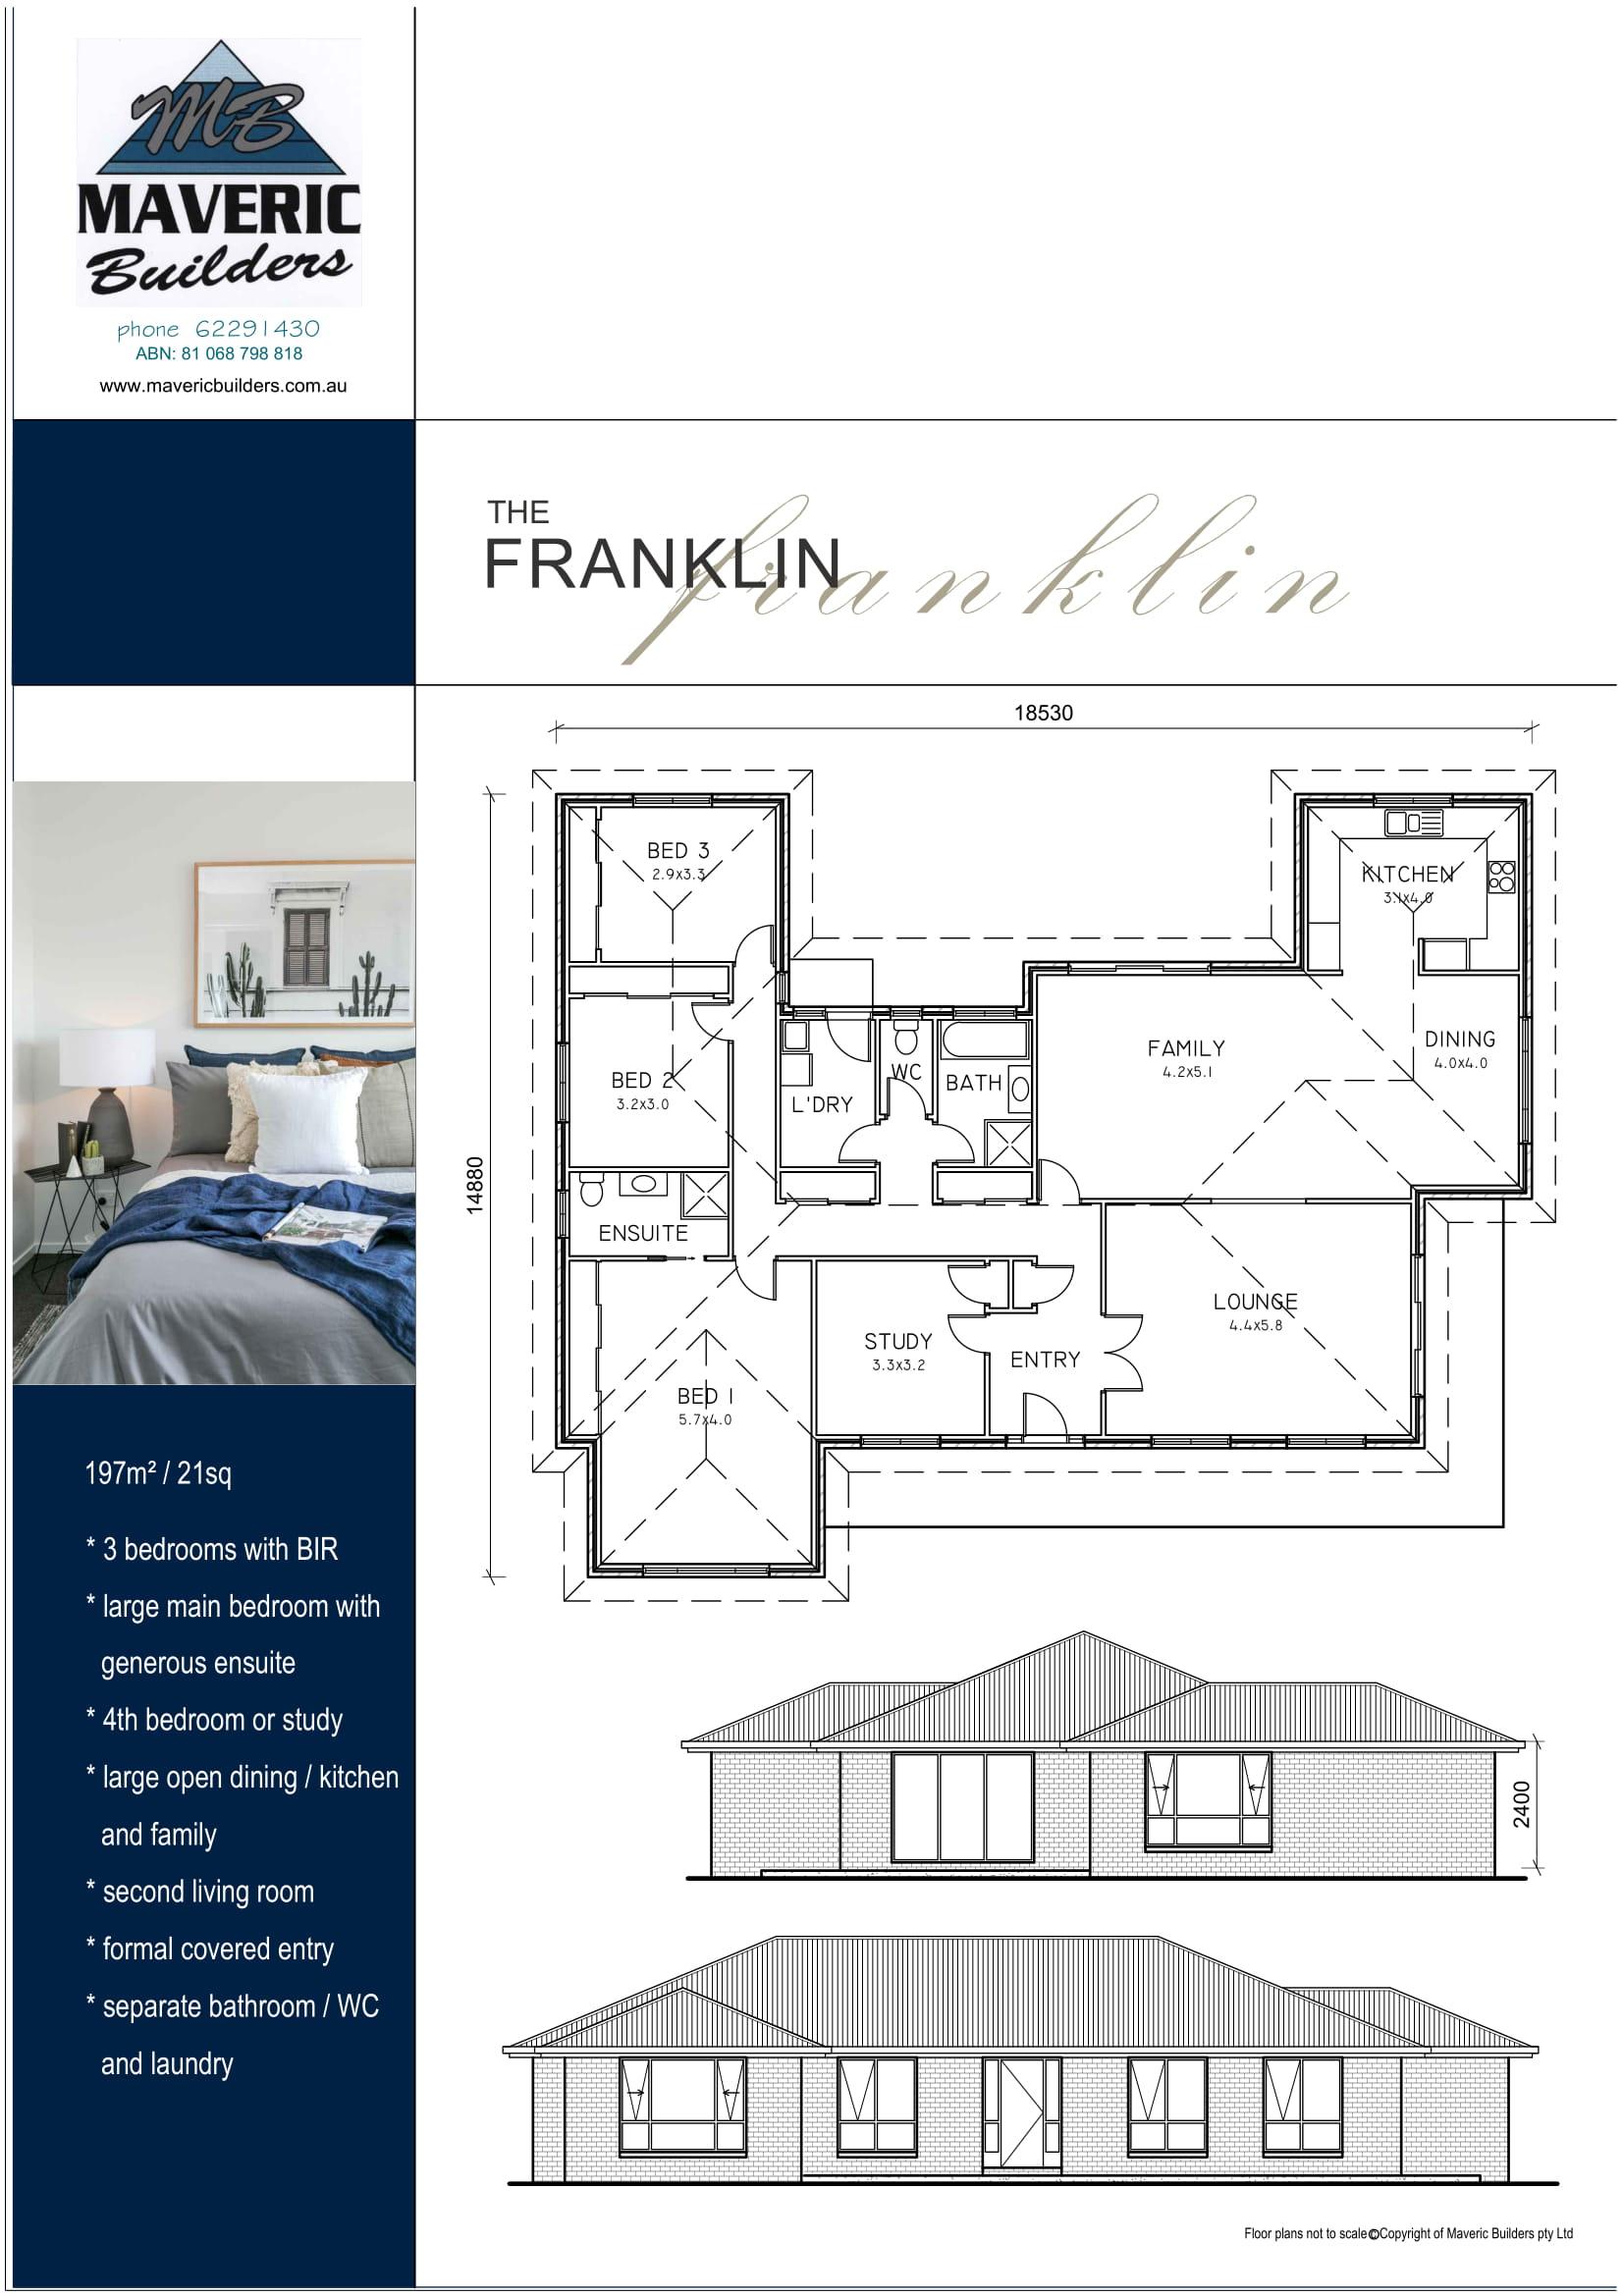 A4 Brochures 2019 01 - 24-19.jpg